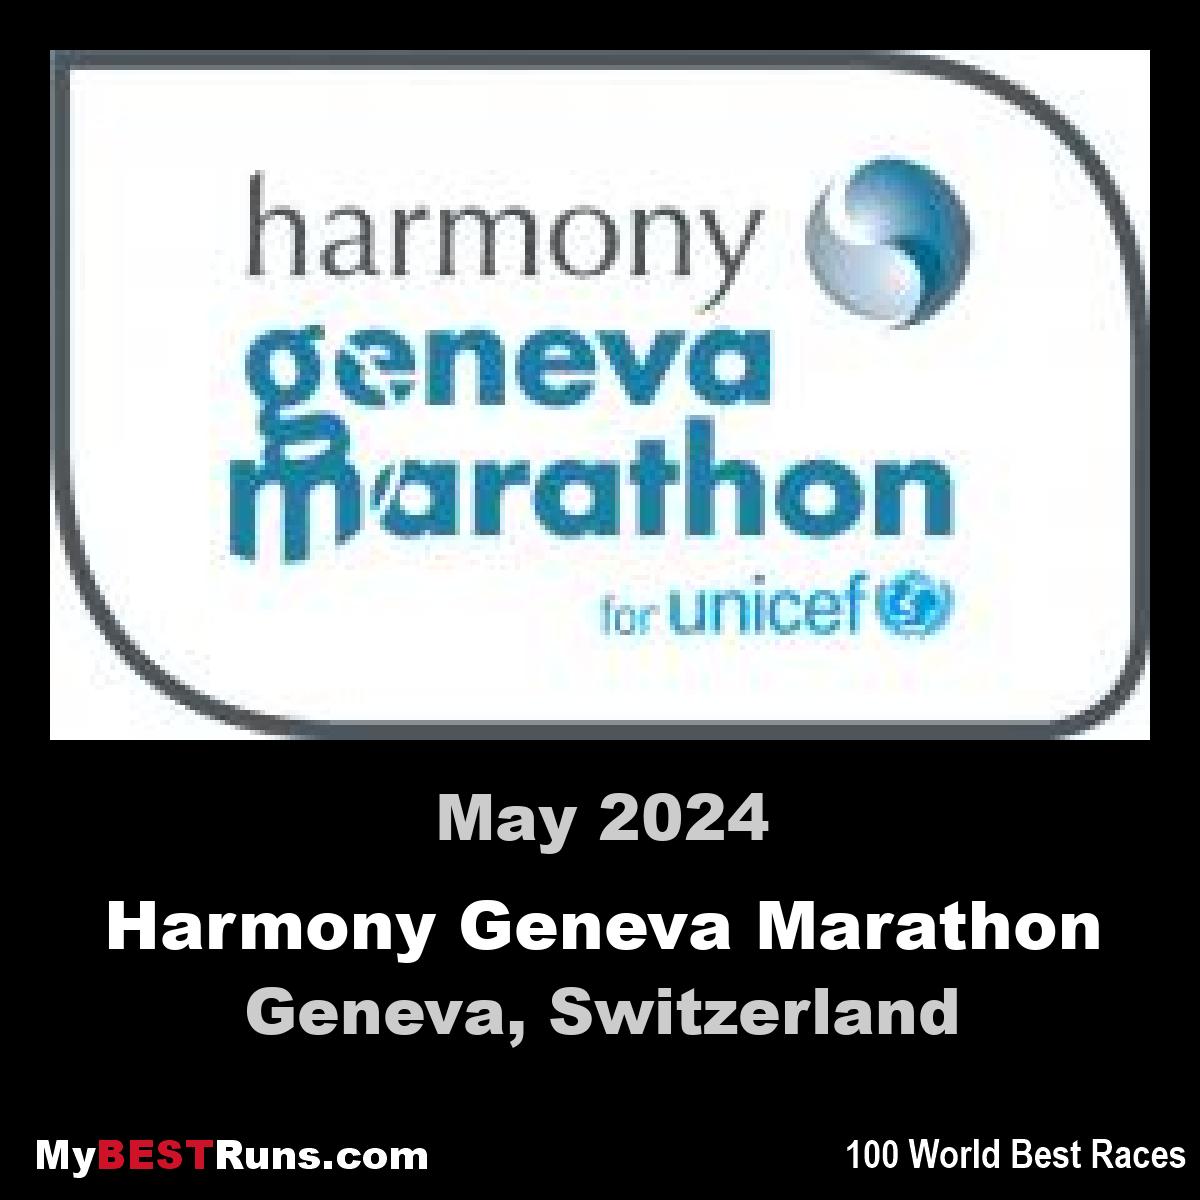 Harmony Geneva Marathon